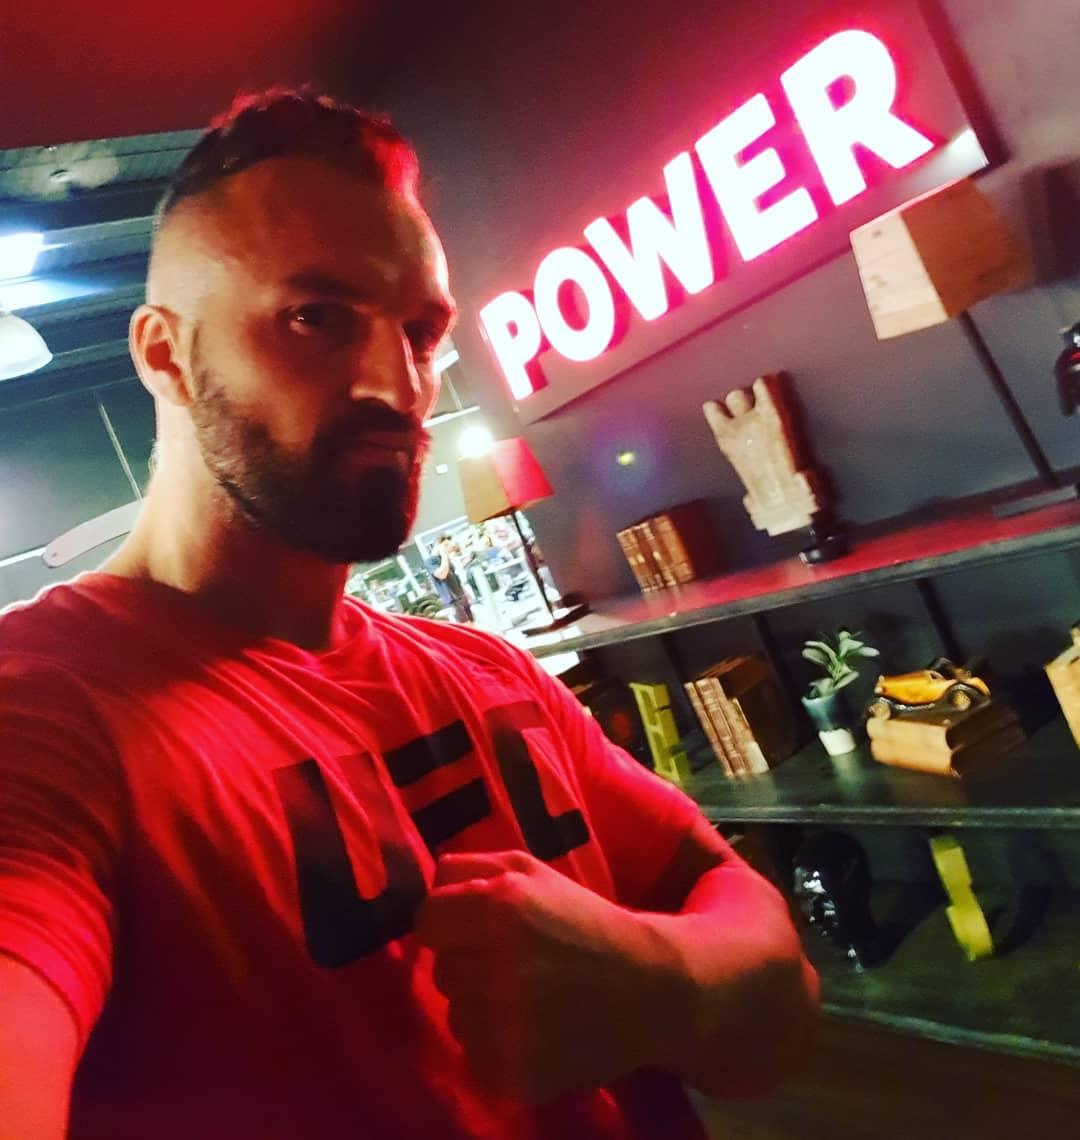 Feuer frei! 💪🏻💪🏻💪🏻💣🔥💥 . #sport #fitness #fitfam #bodybuilding #mcfit #johnreed #mcfitberlin #johnreedberlin #gym #motivation #selfie #me #thumbsup #potd #instalike #instagood #berlin #berliner #followme #l4l #f4f #igers #mondaymotivation #therock #power #ufc